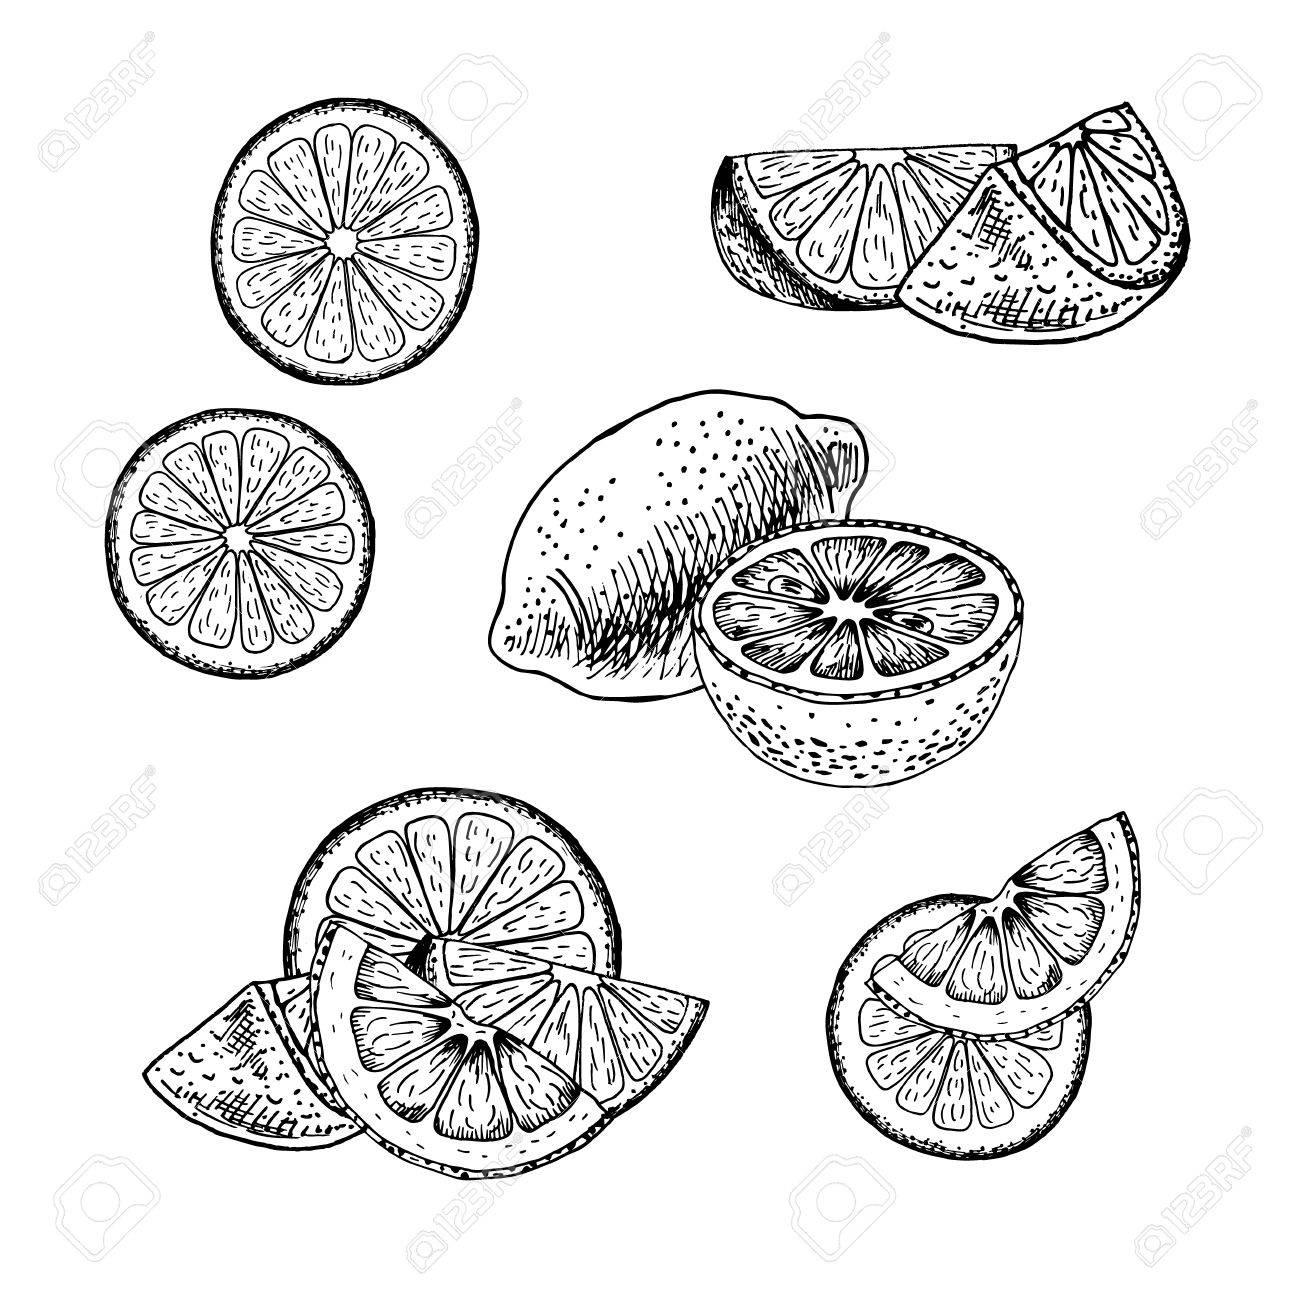 1300x1300 Hand Drawn Set Of Lemon. Retro Isolated Sketches. Vintage